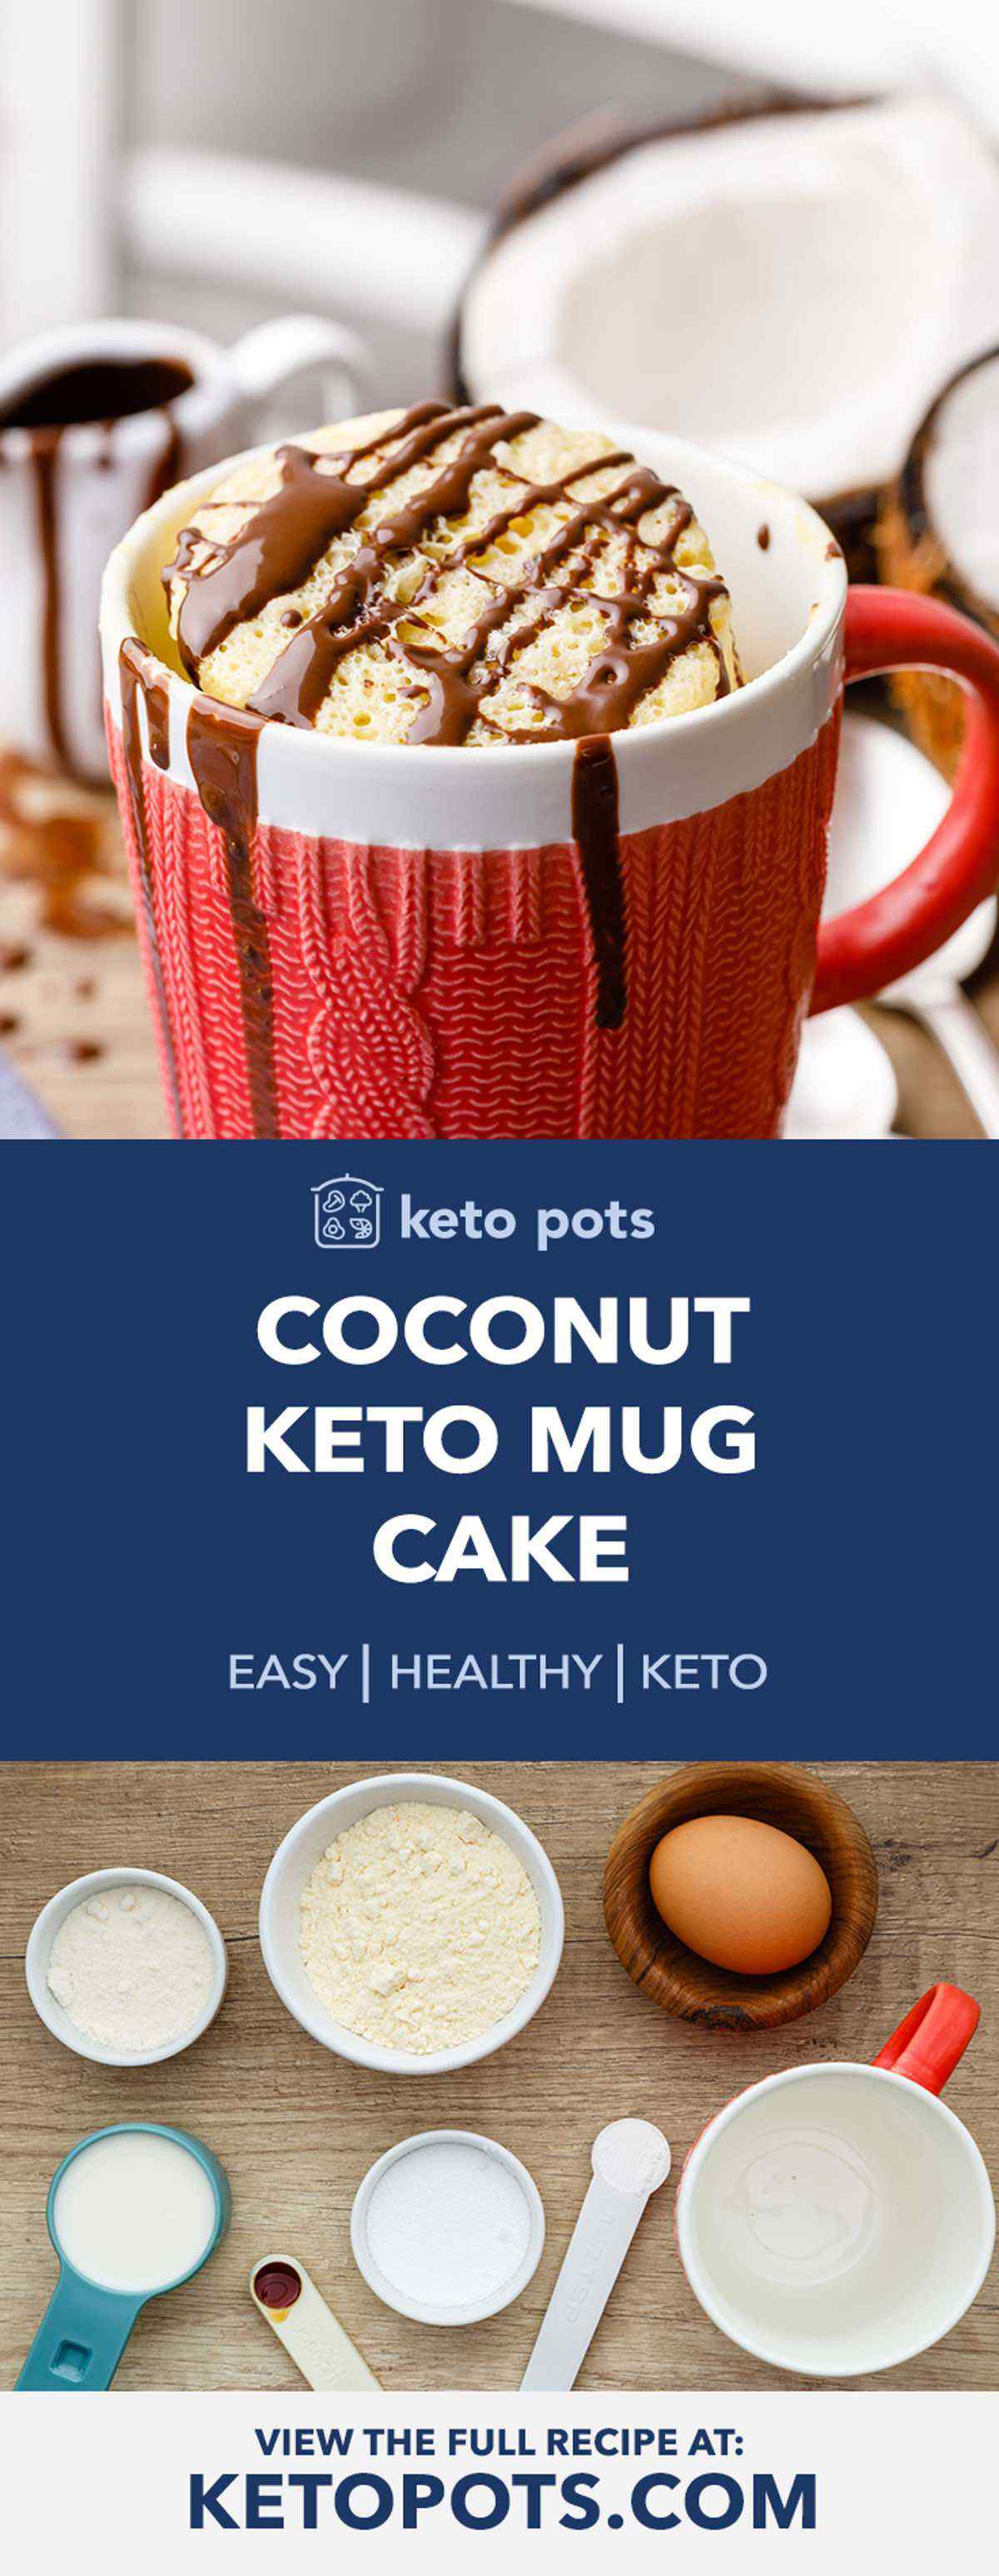 Keto Coconut Mug Cake